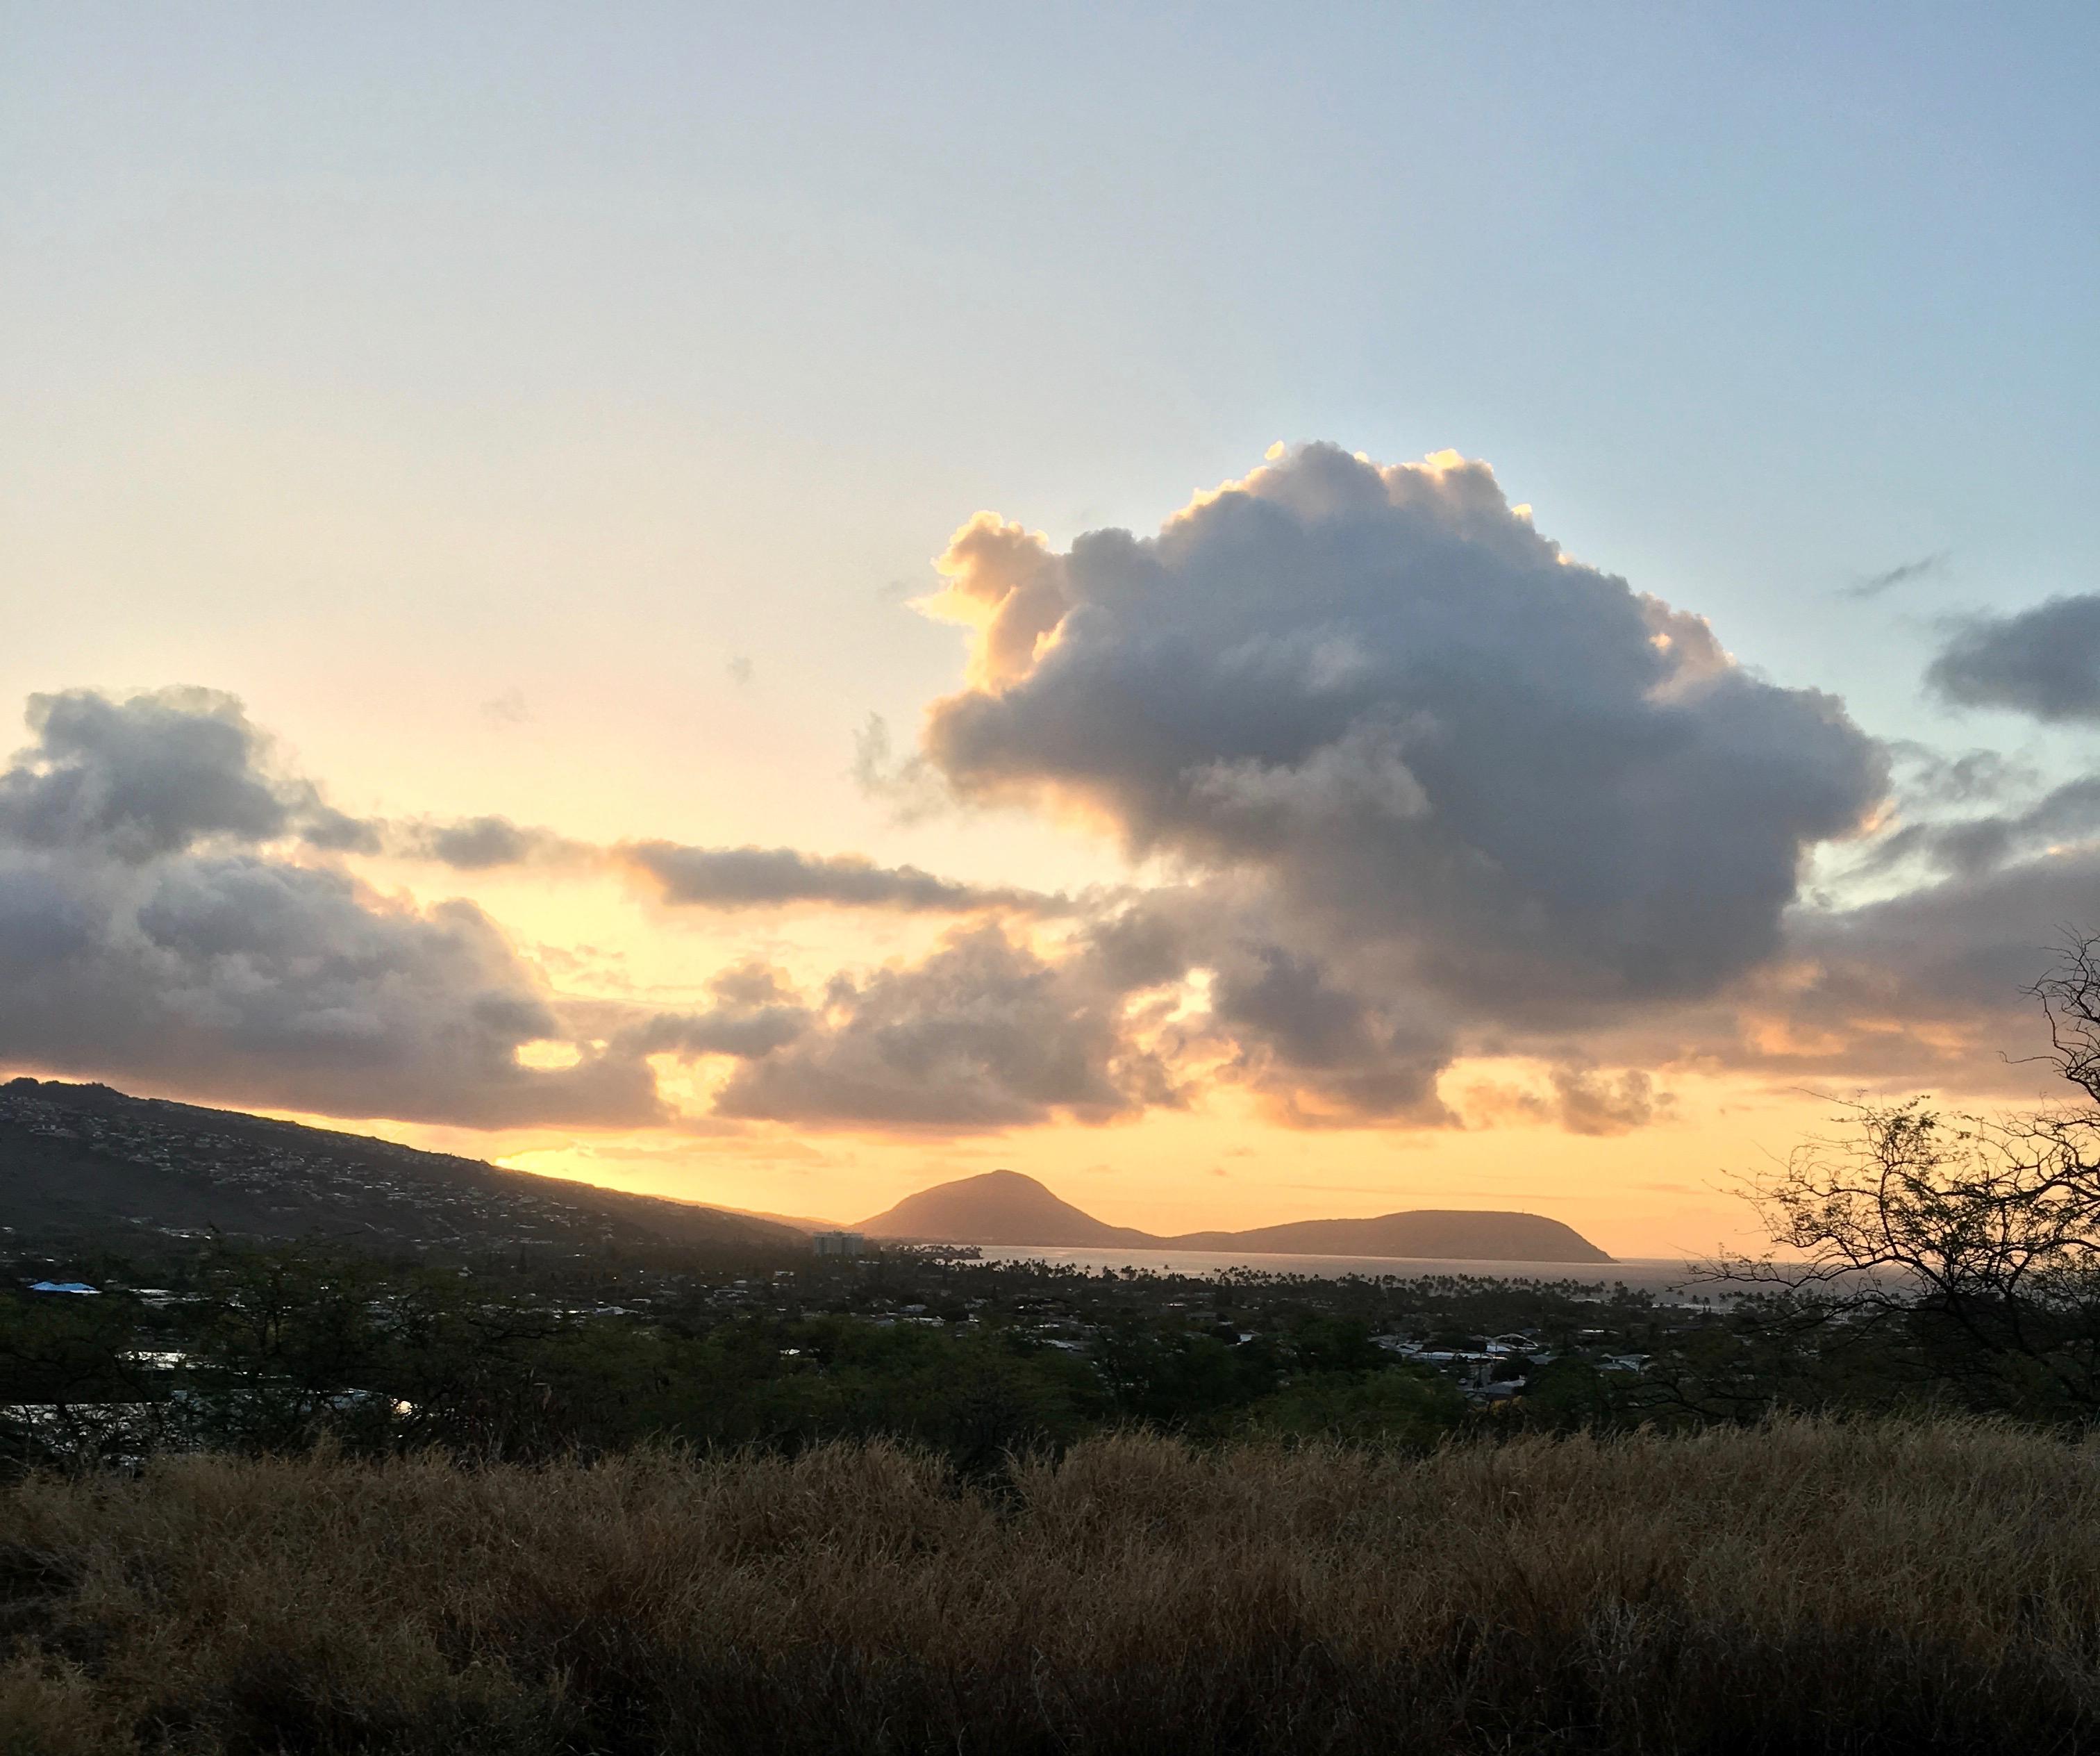 Diamond Head Crater trail, hiking Diamond Head, hiking in oahu, things to do in oahu, sunrise on oahu, sunrise trails in Honolulu, Sunrise trails in hawaii, easy trails in Hawaii, kid-friendly trails in Hawaii, easy trails in Oahu, family-friendly trails in Hawaii